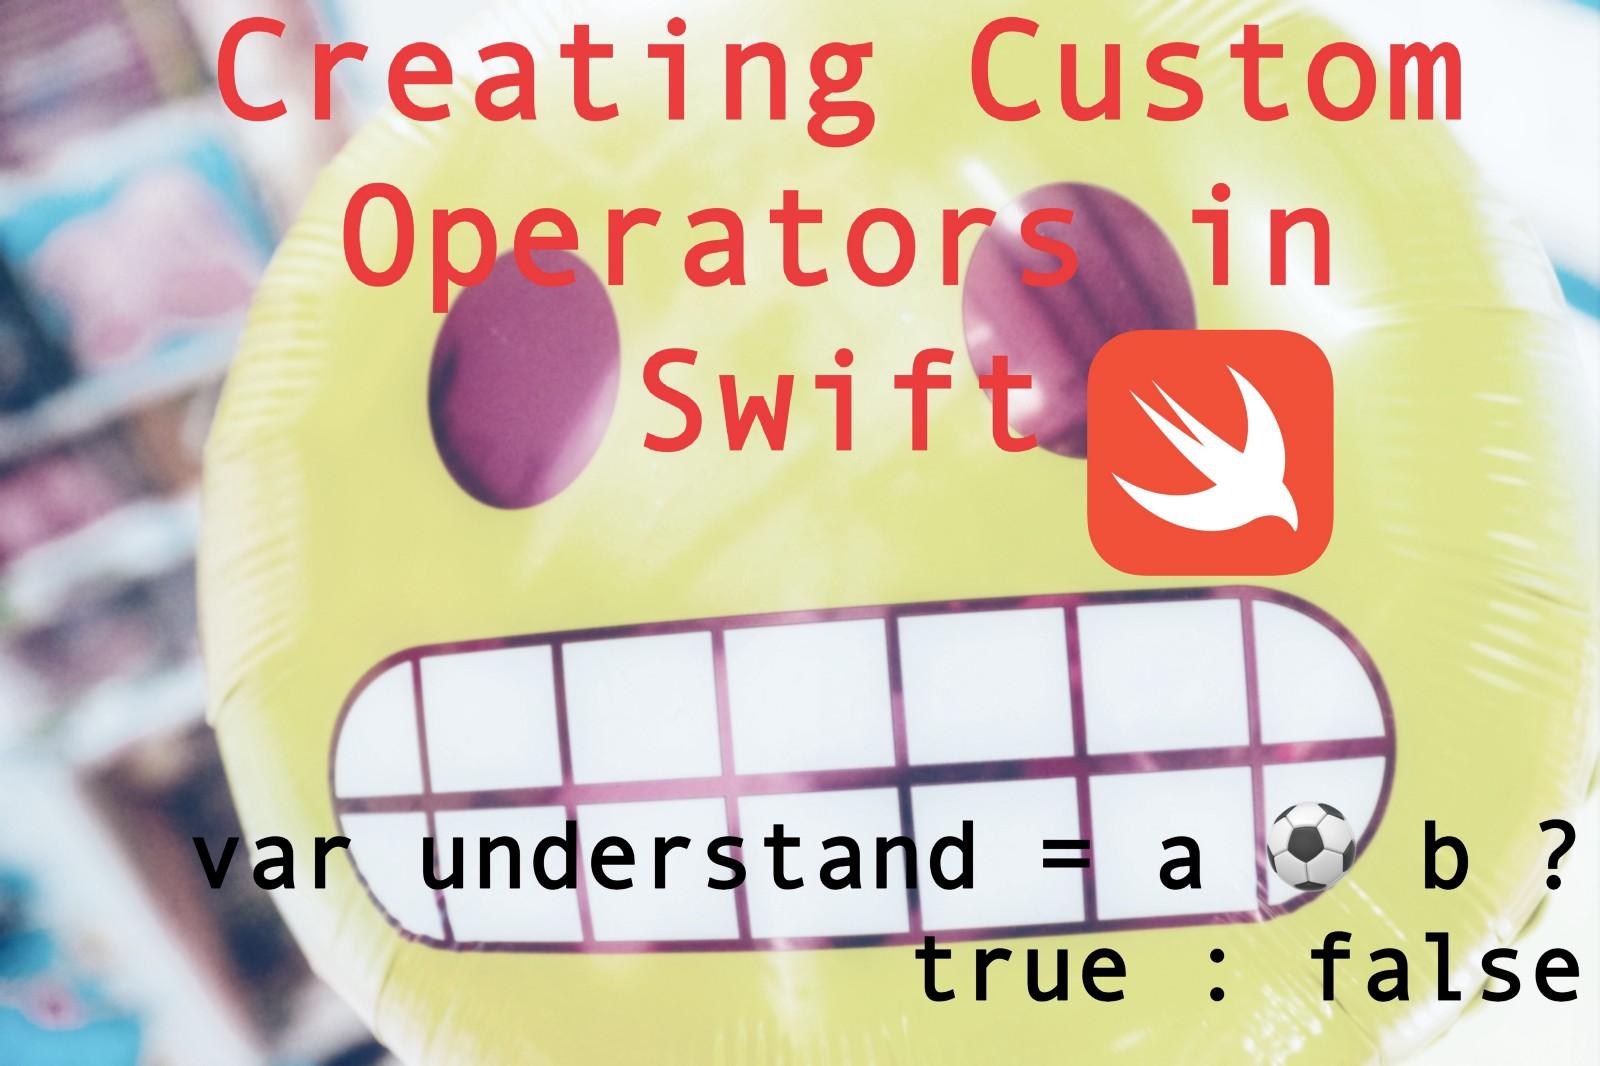 /creating-custom-operators-in-swift-2c8bababbaf6 feature image